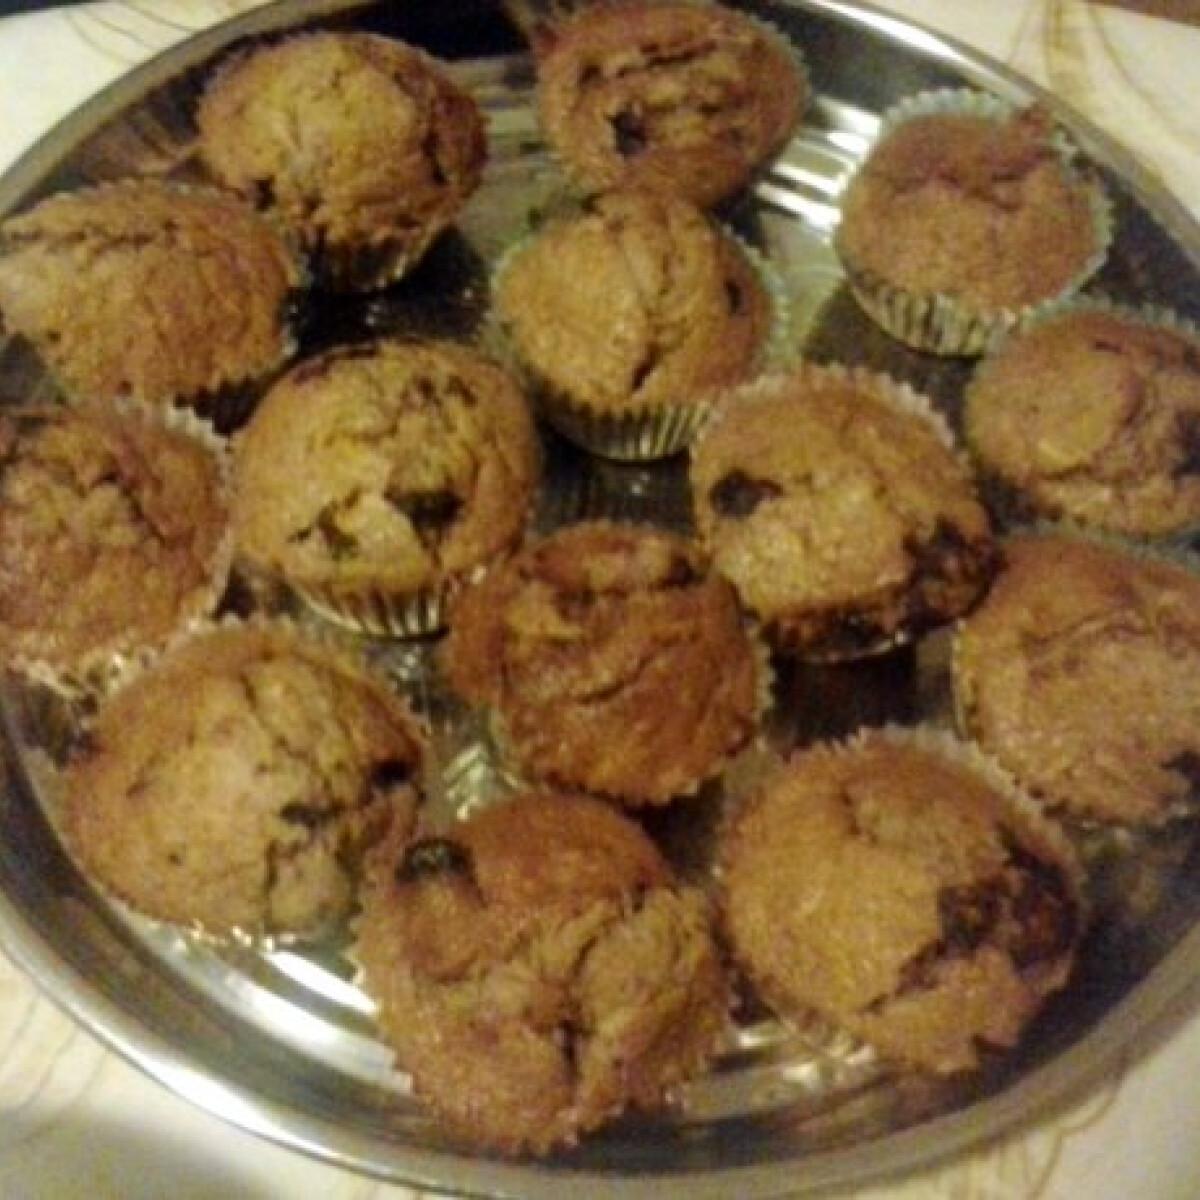 Almás-csokis muffin Chilu konyhájából